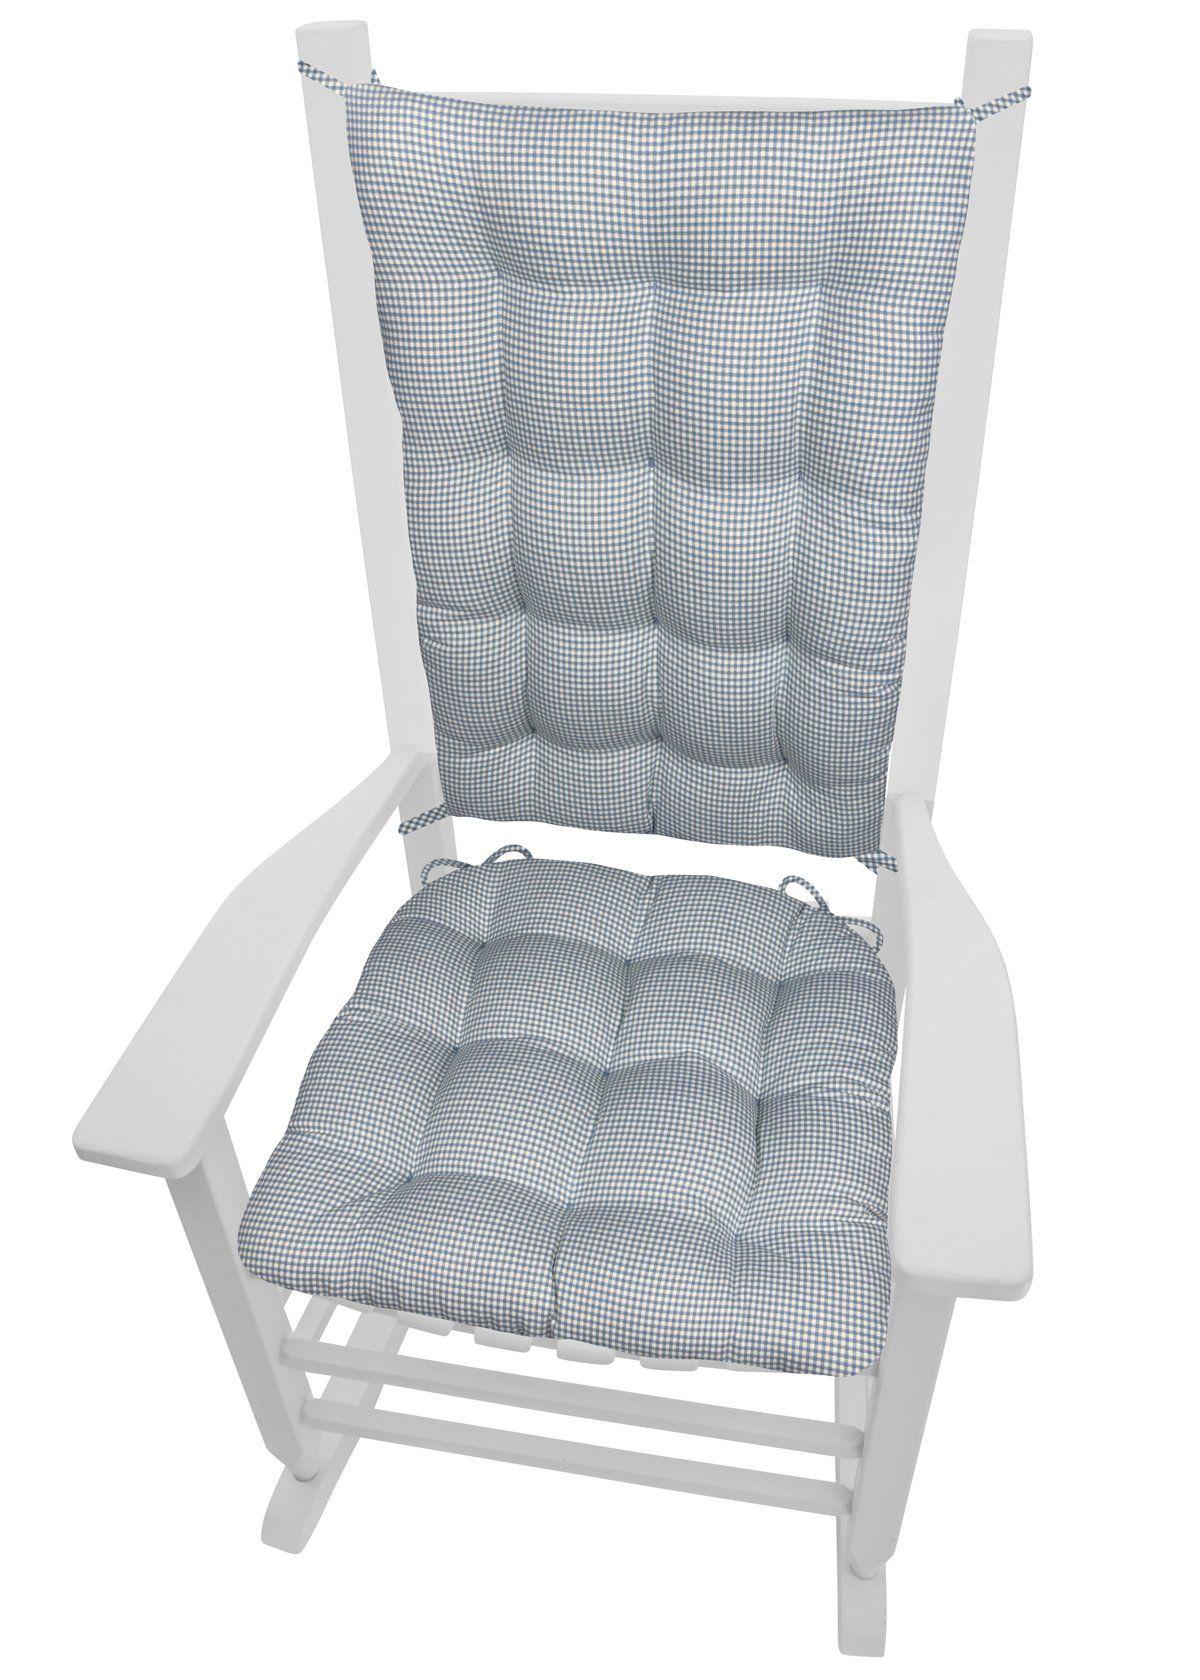 Madrid Lake Blue Gingham Rocking Chair Cushions Rocking